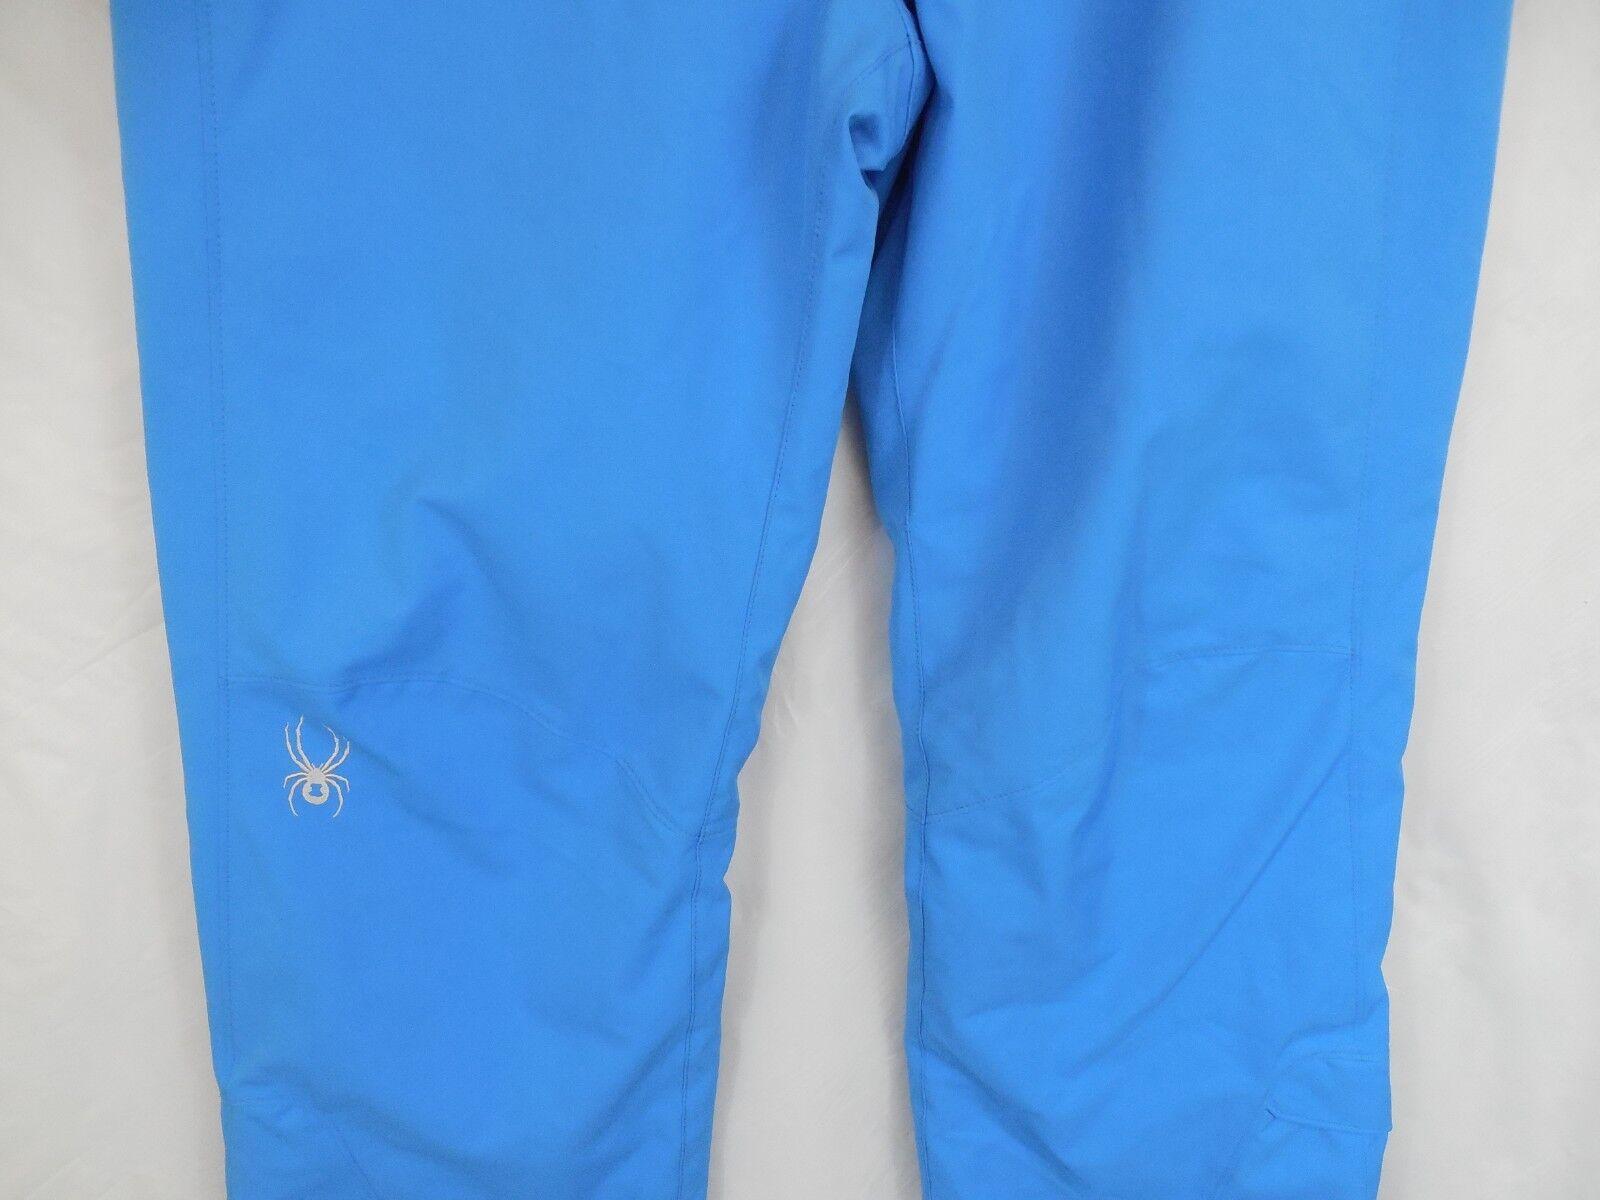 Damenschuhe 8 Spyder Blau Ski Snowboard Winner Pants TailoROT Pants Winner Spylon 10k 3b079a